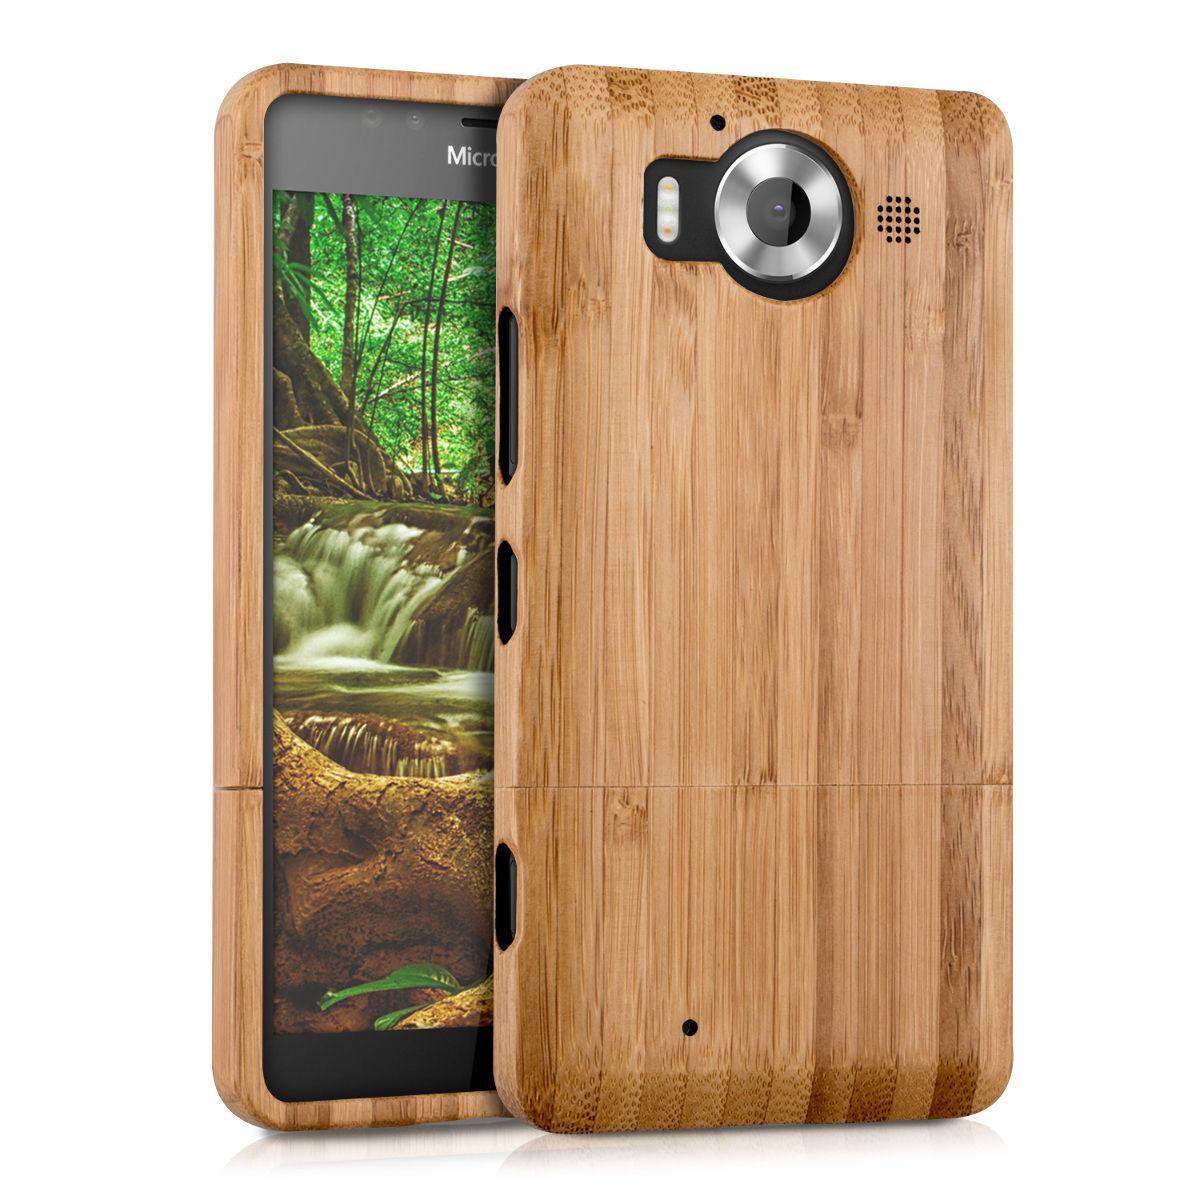 Pouzdro pro Microsoft Lumia 950 bambus